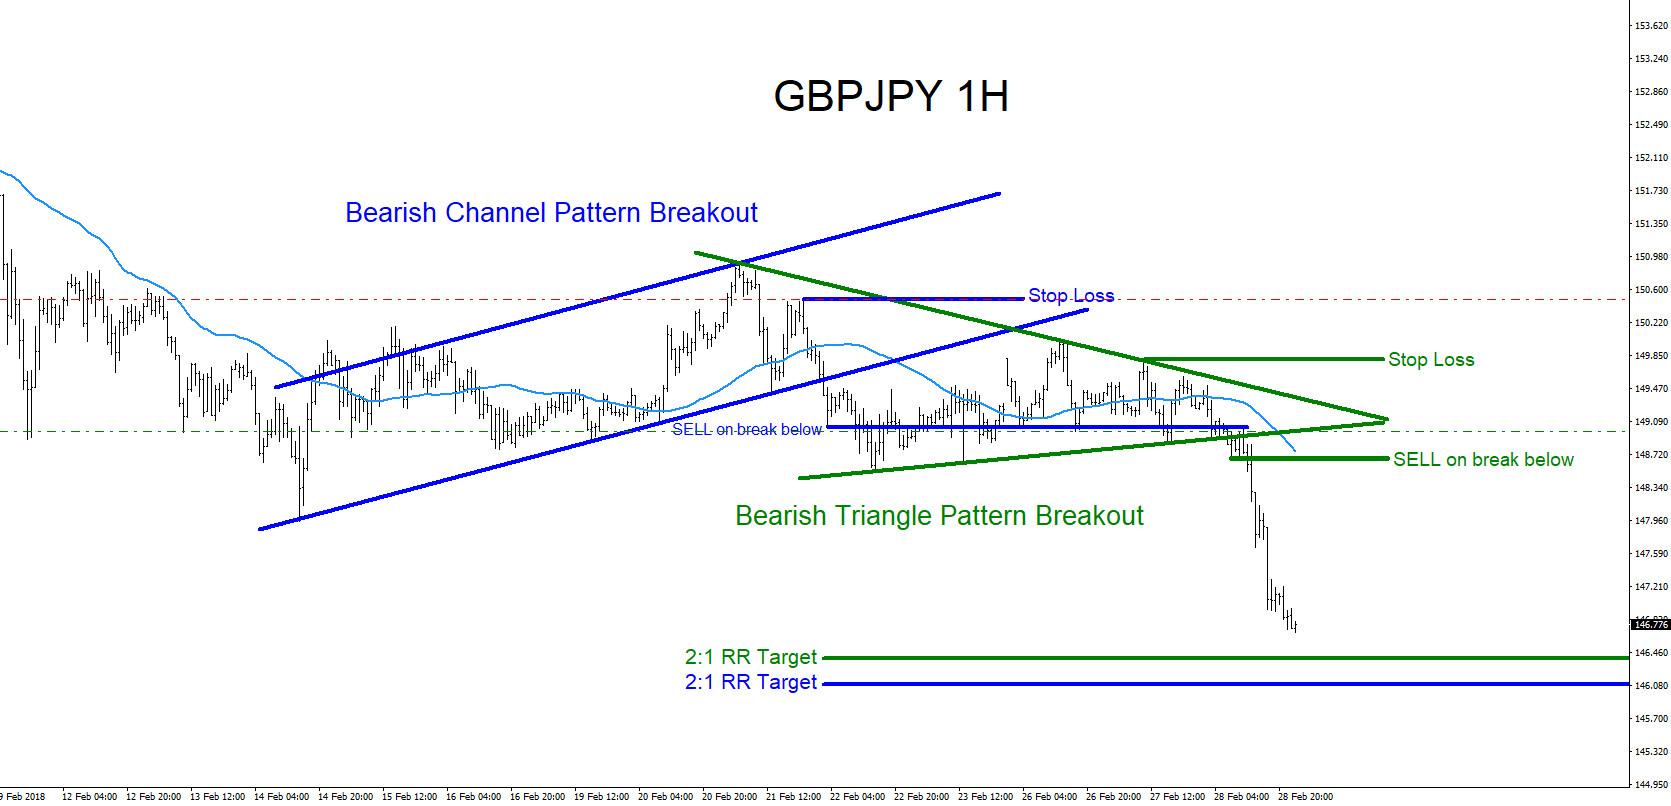 GBPJPY : Trading Market Patterns